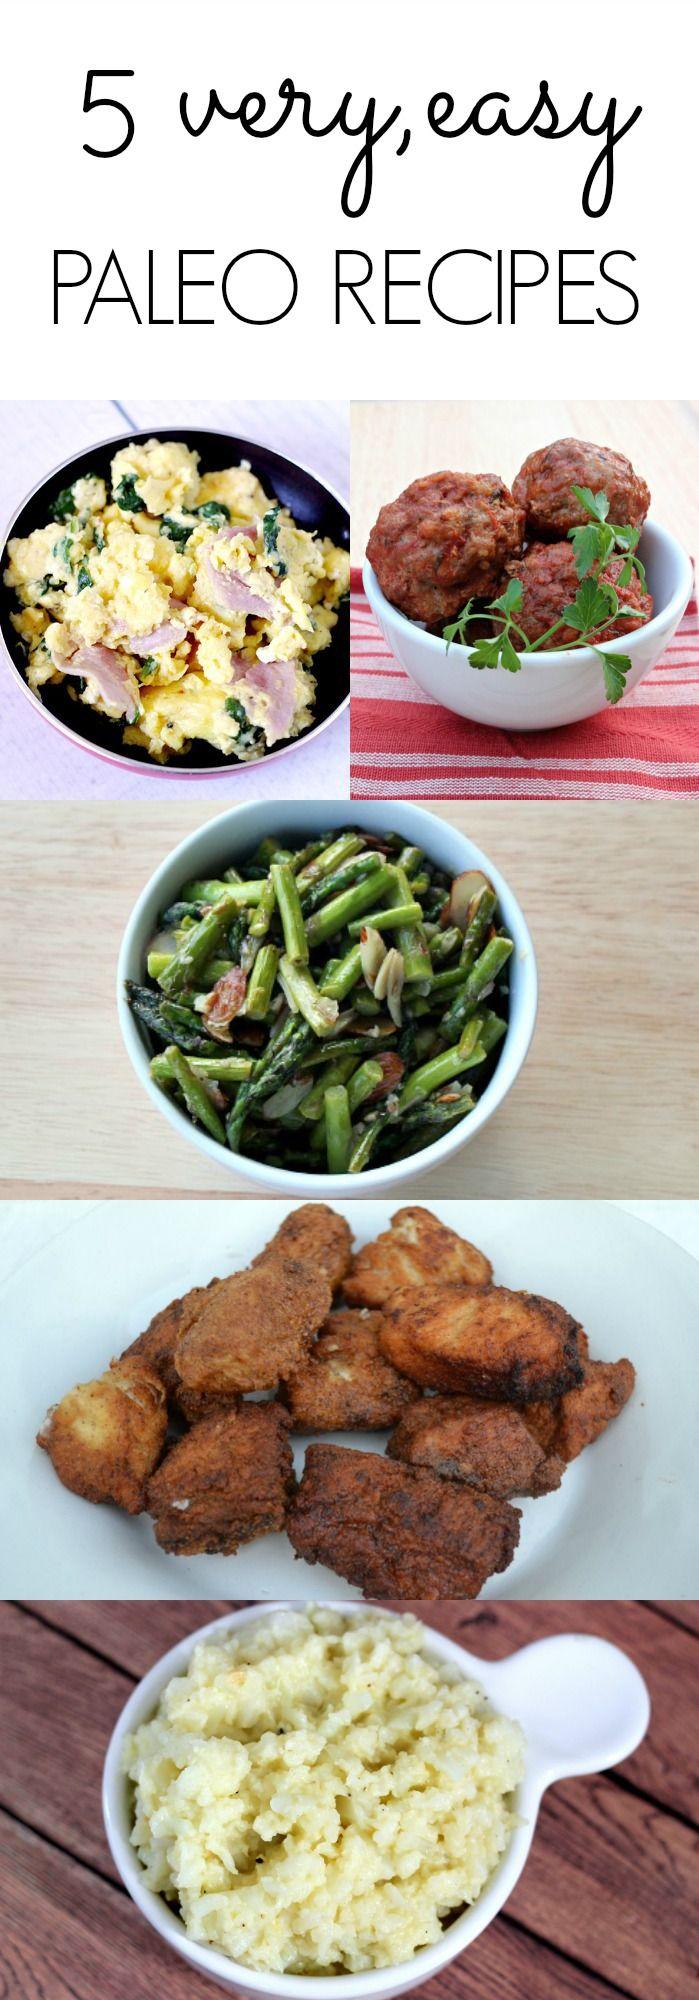 5 Easy Paleo Recipes from 2013 - Bravo For Paleo